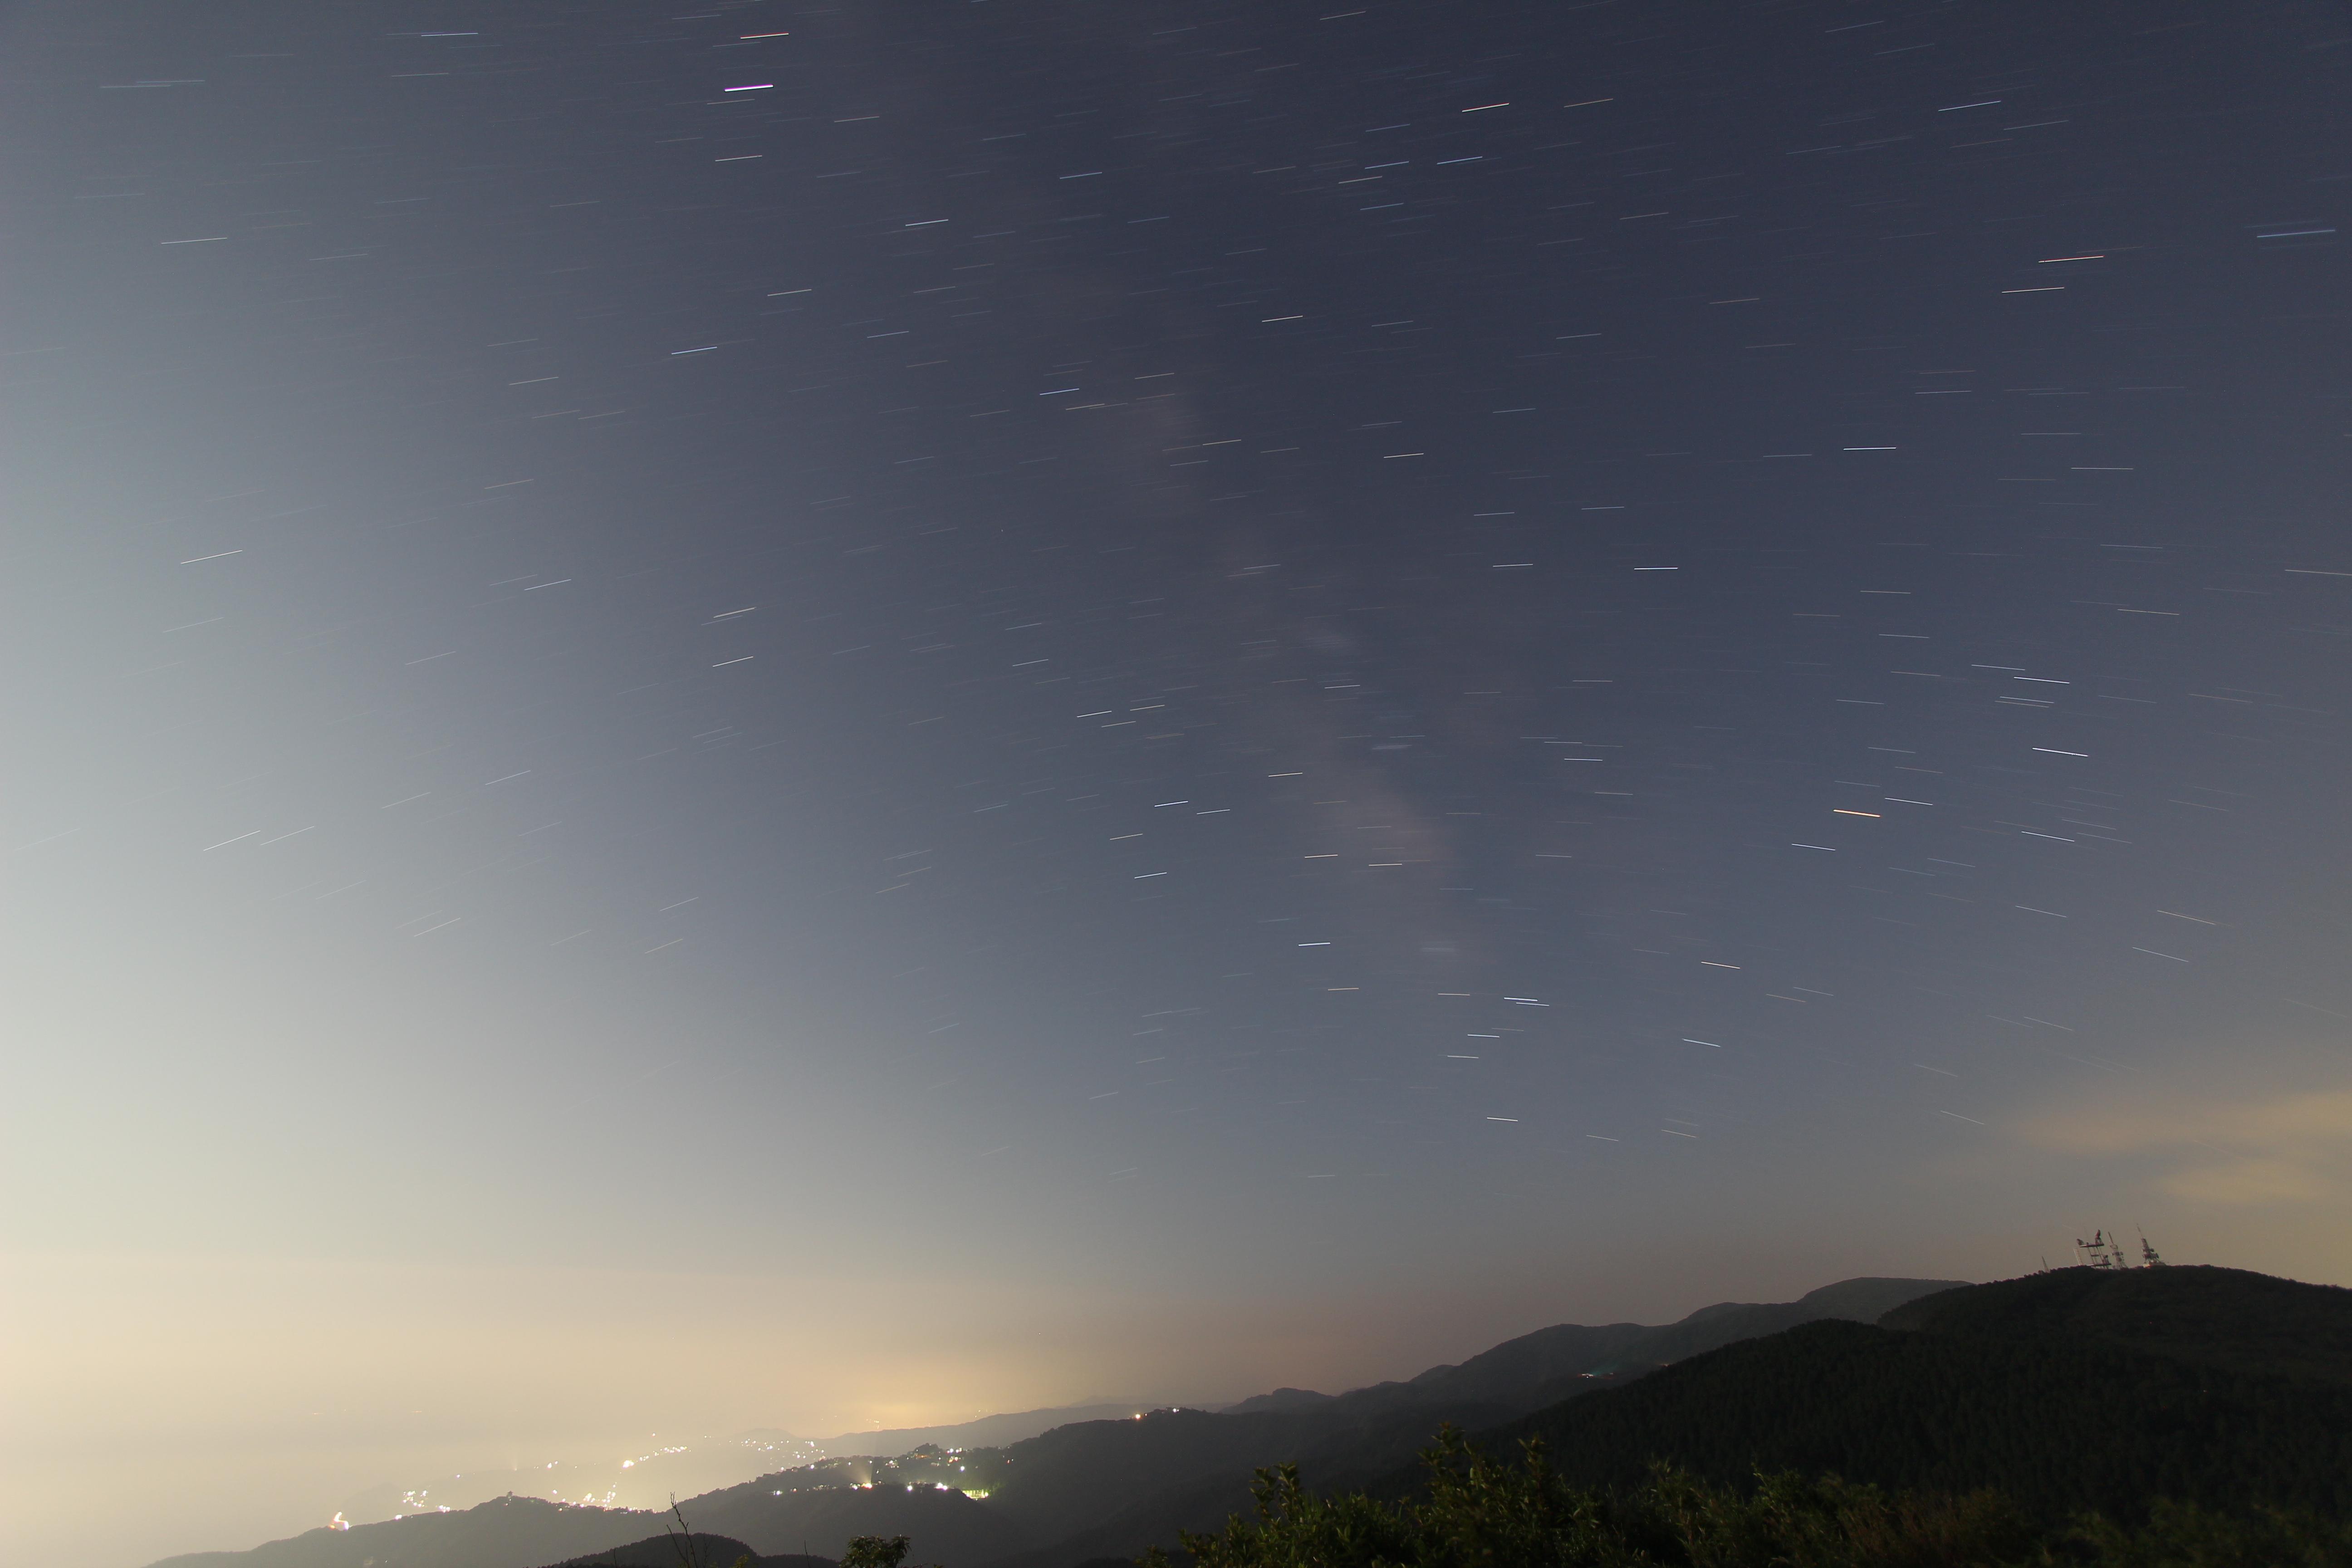 <b>超広角ズームレンズの広角端で南の空を撮影。約8分間弱の露光で星の軌跡を撮影することができた。</b>